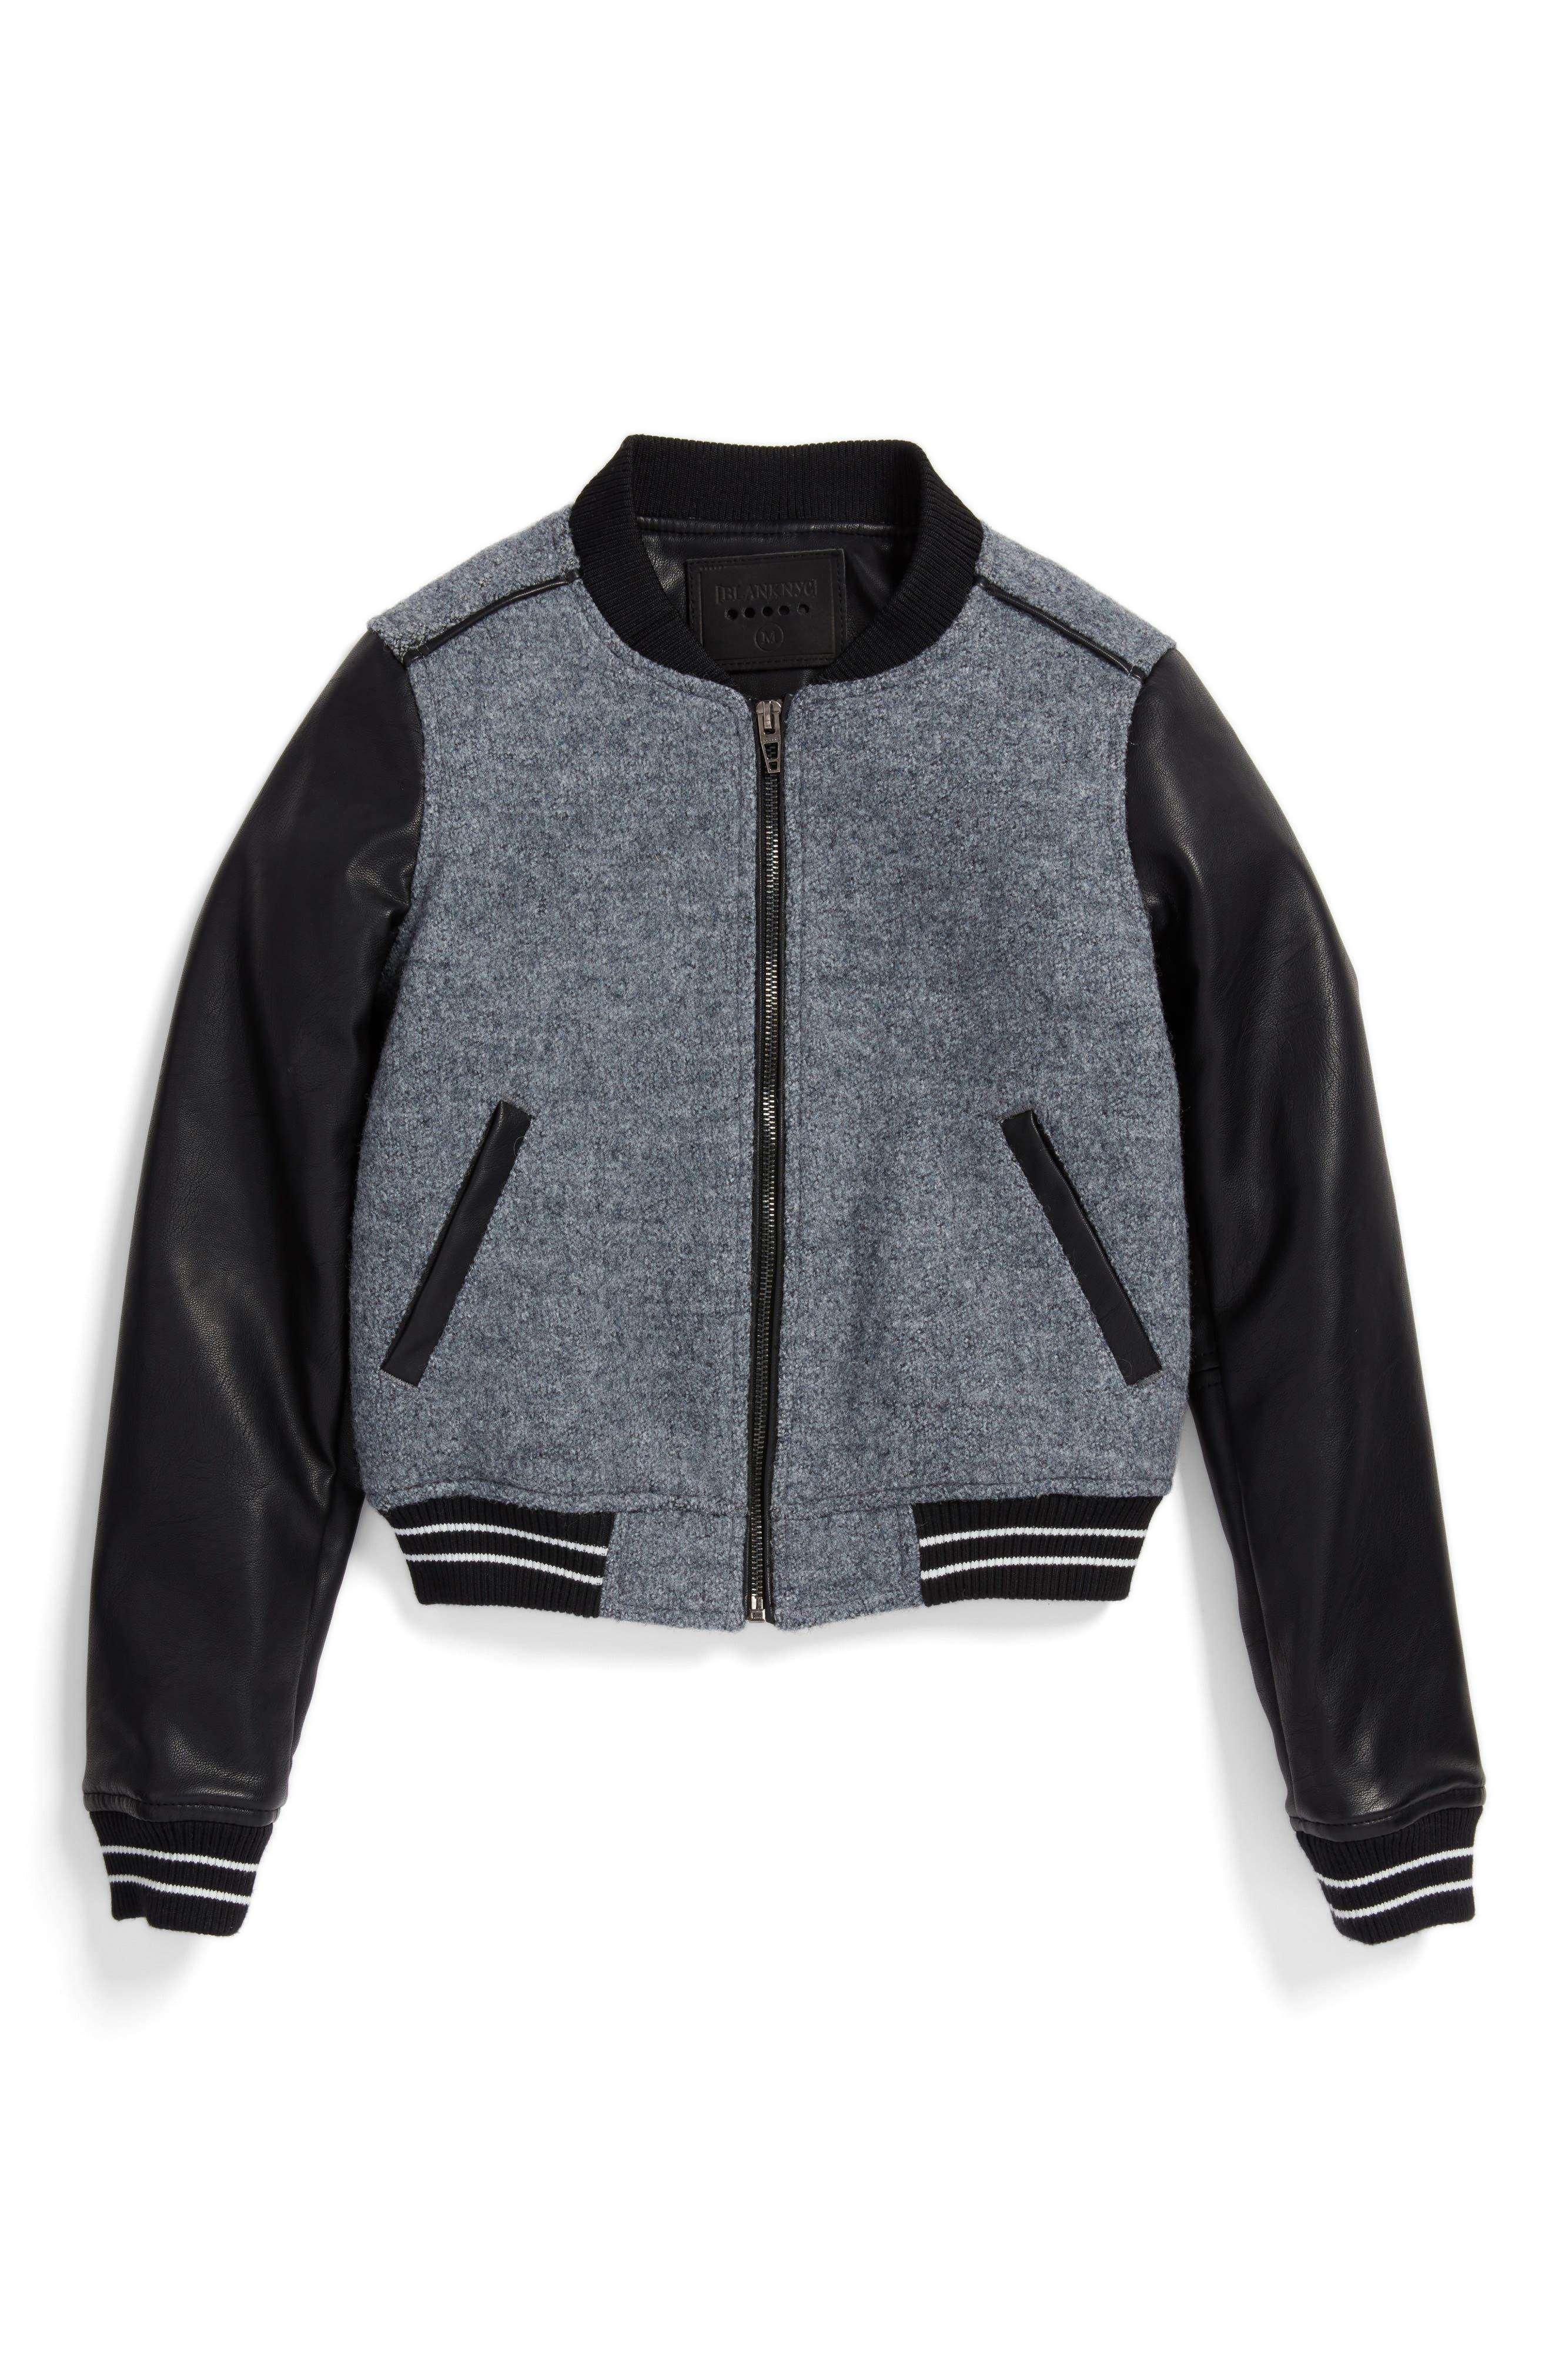 Alternate Image 1 Selected - BLANKNYC Own the Night Bomber Jacket (Big Girls)